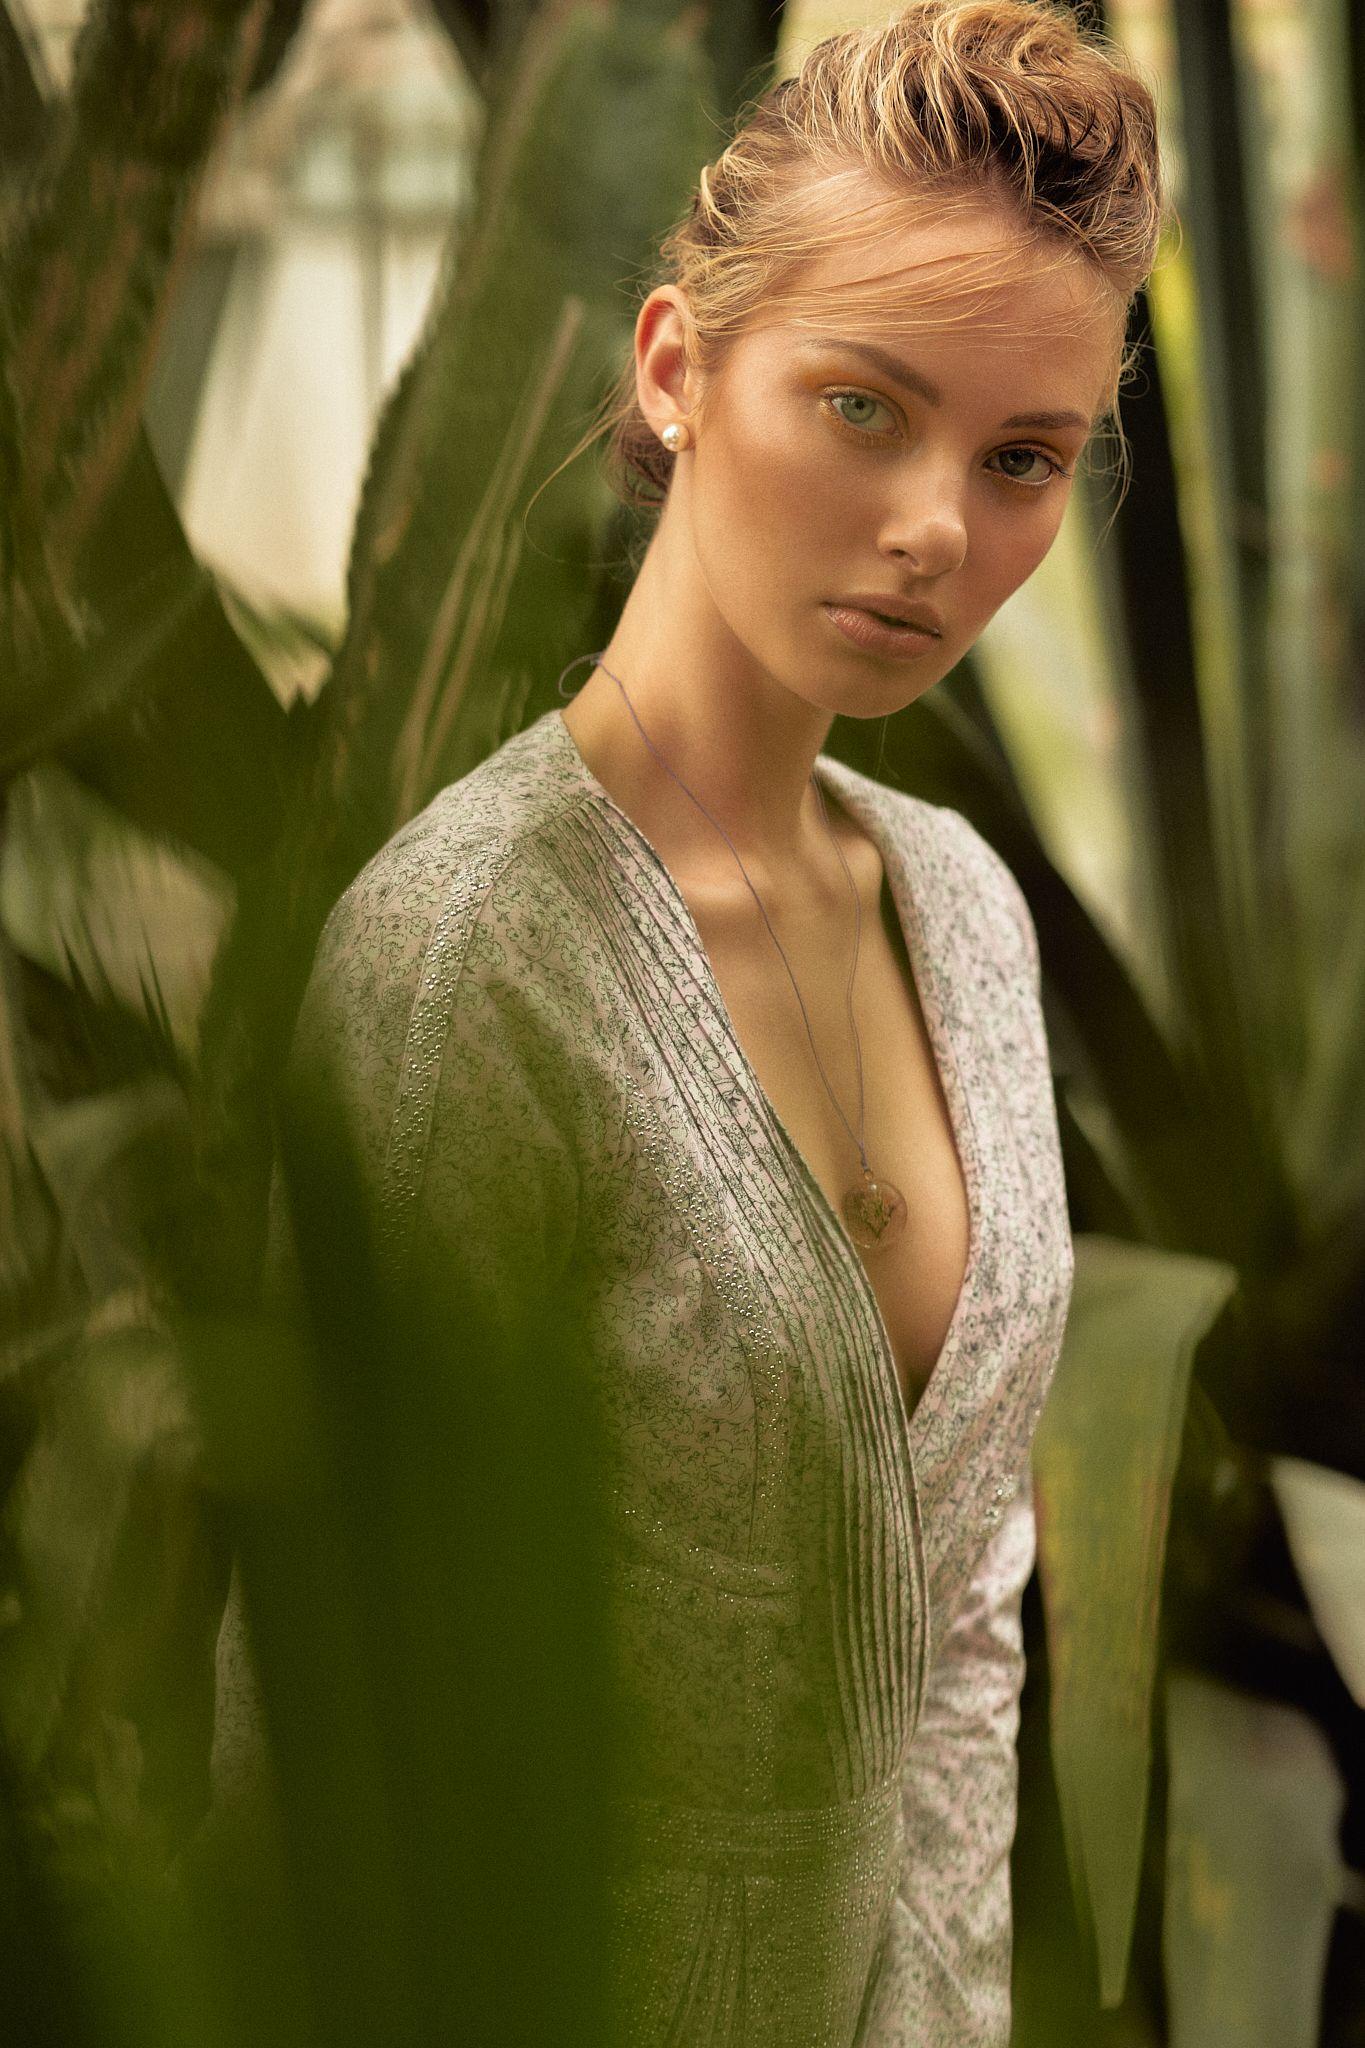 Garden of Eden - Solstice Magazine UK - Outtakes - Pic. 7